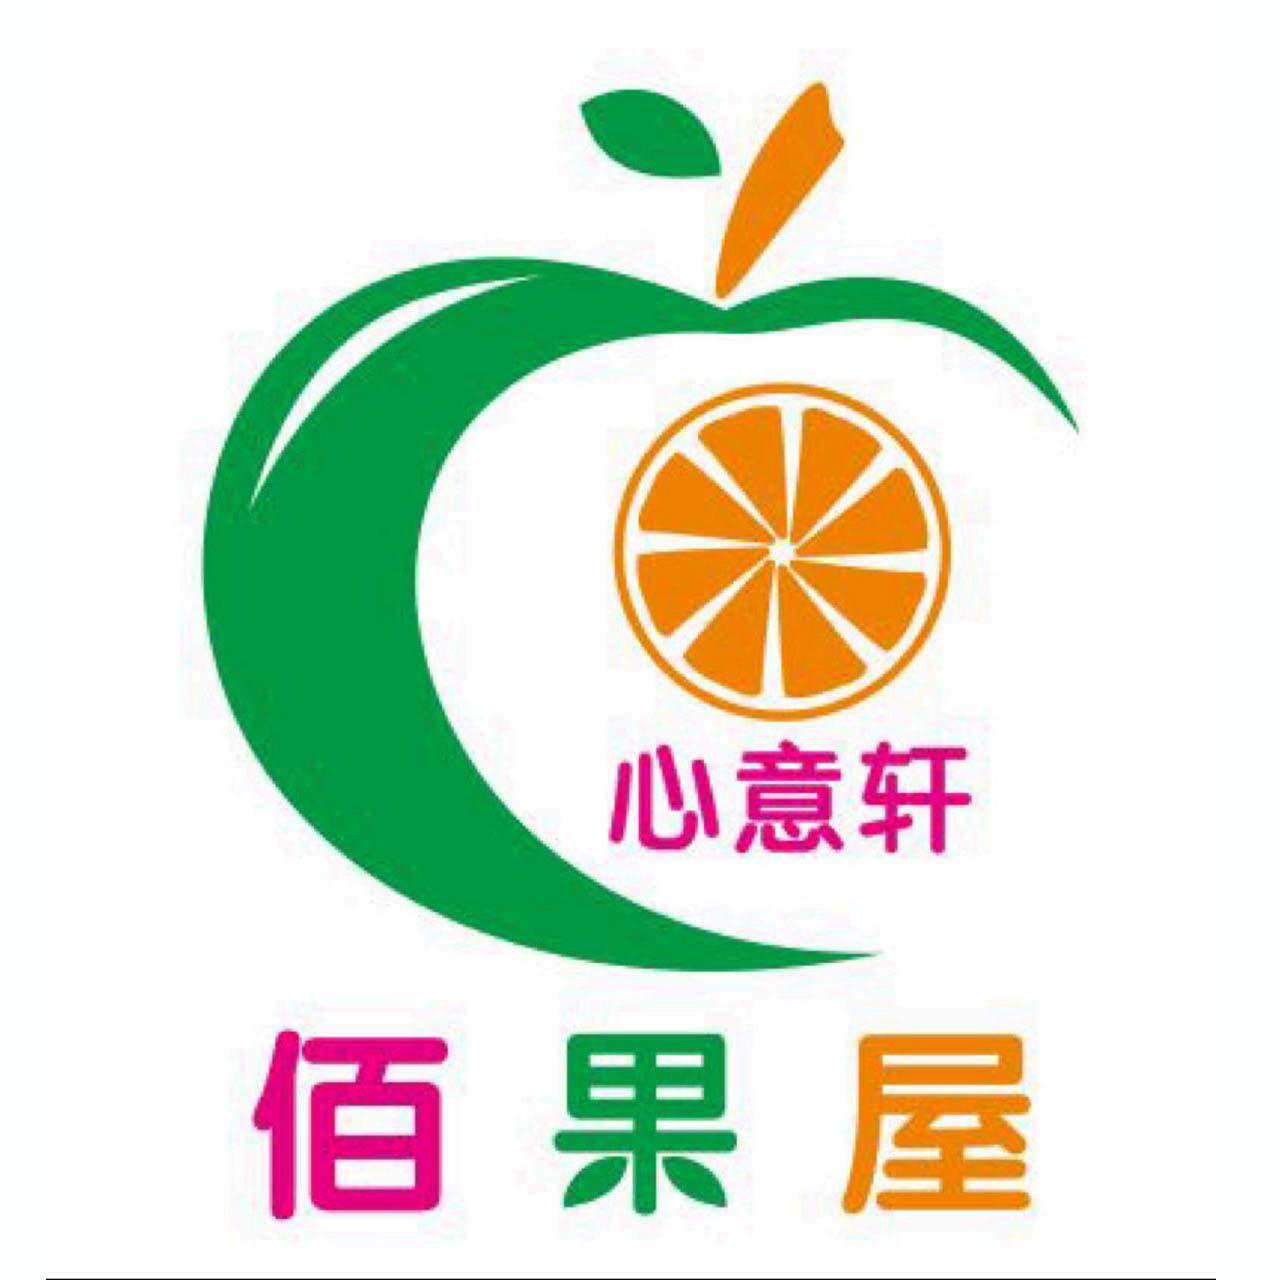 logo logo 标志 设计 图标 1280_1280